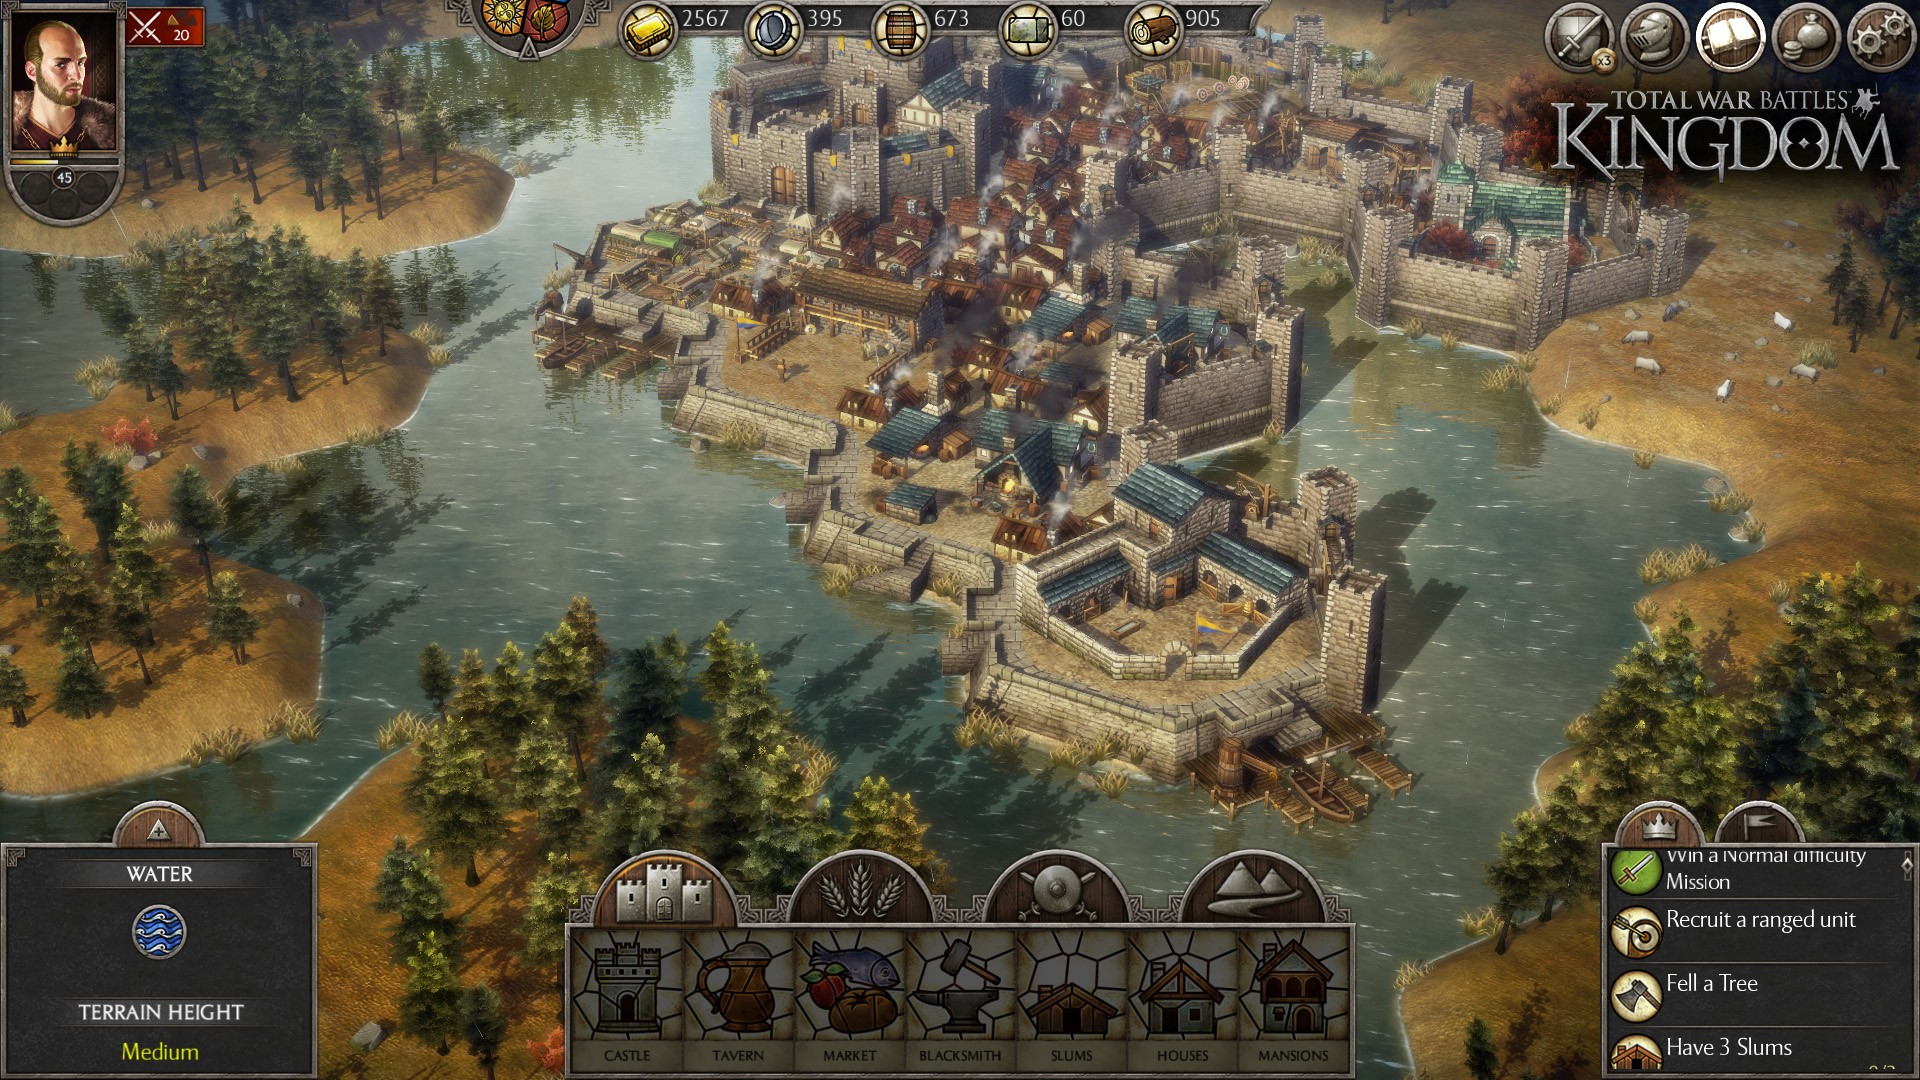 SEGA Brings Total War Battles: Kingdom to Android